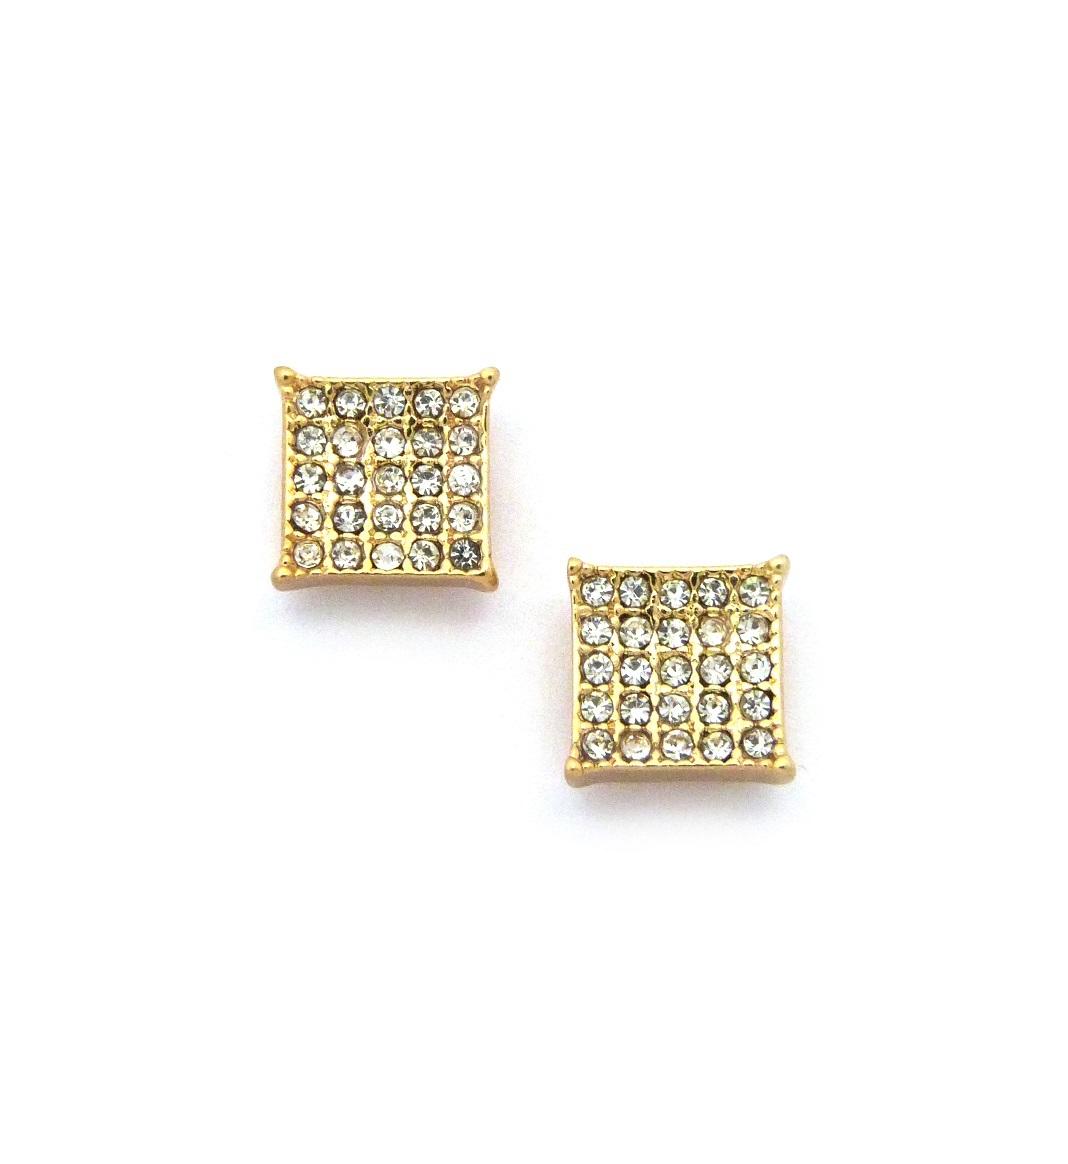 3e47683e2fa1a Iced Out Kite Cut Diamond CZ Bling Earrings to Make a Fine Addition ...